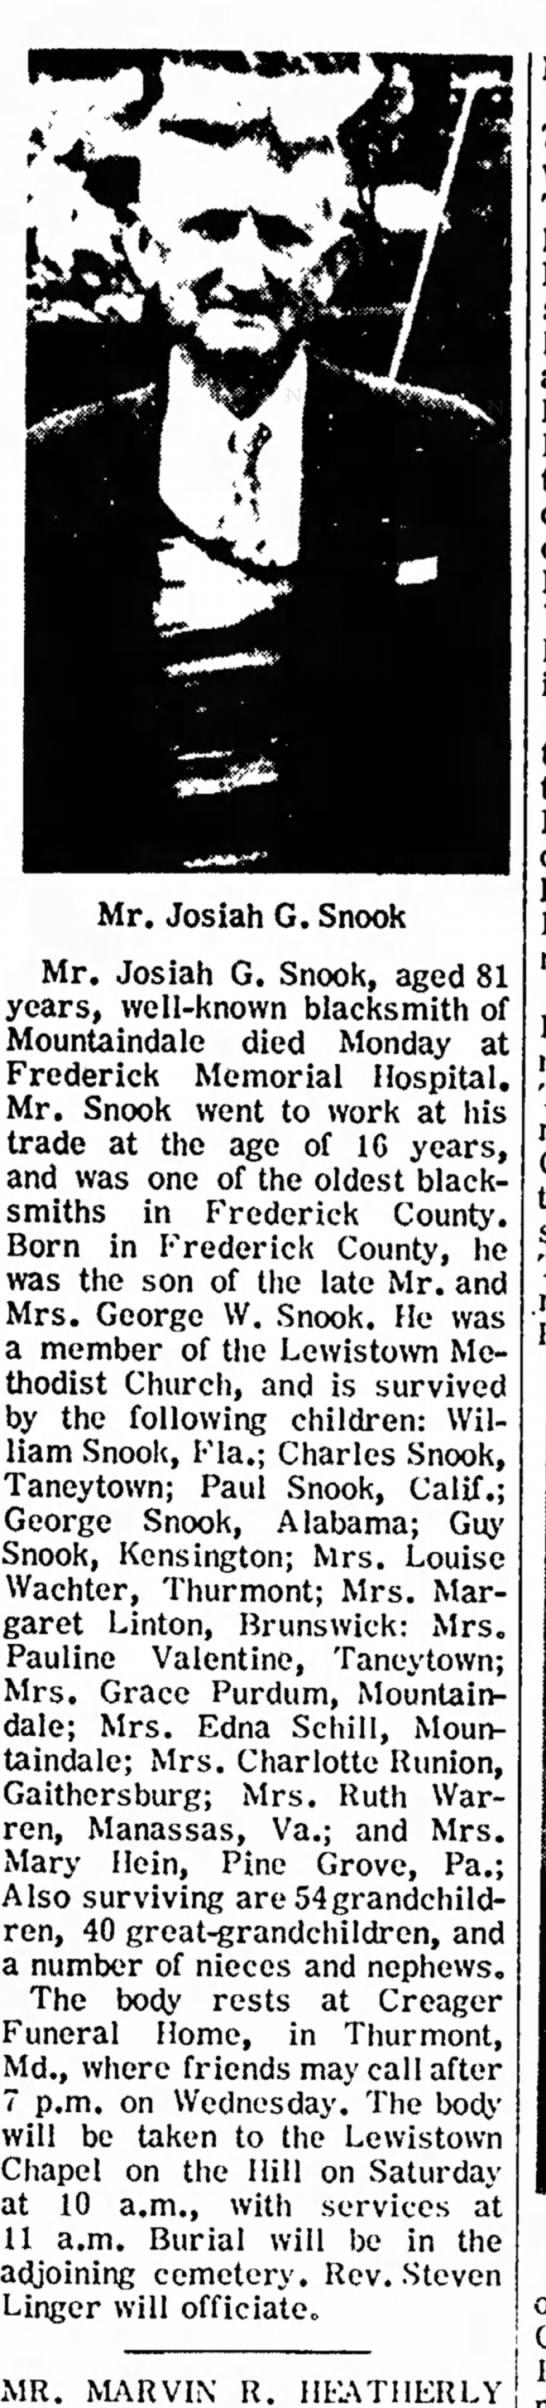 Josiah G. Snook Obit -